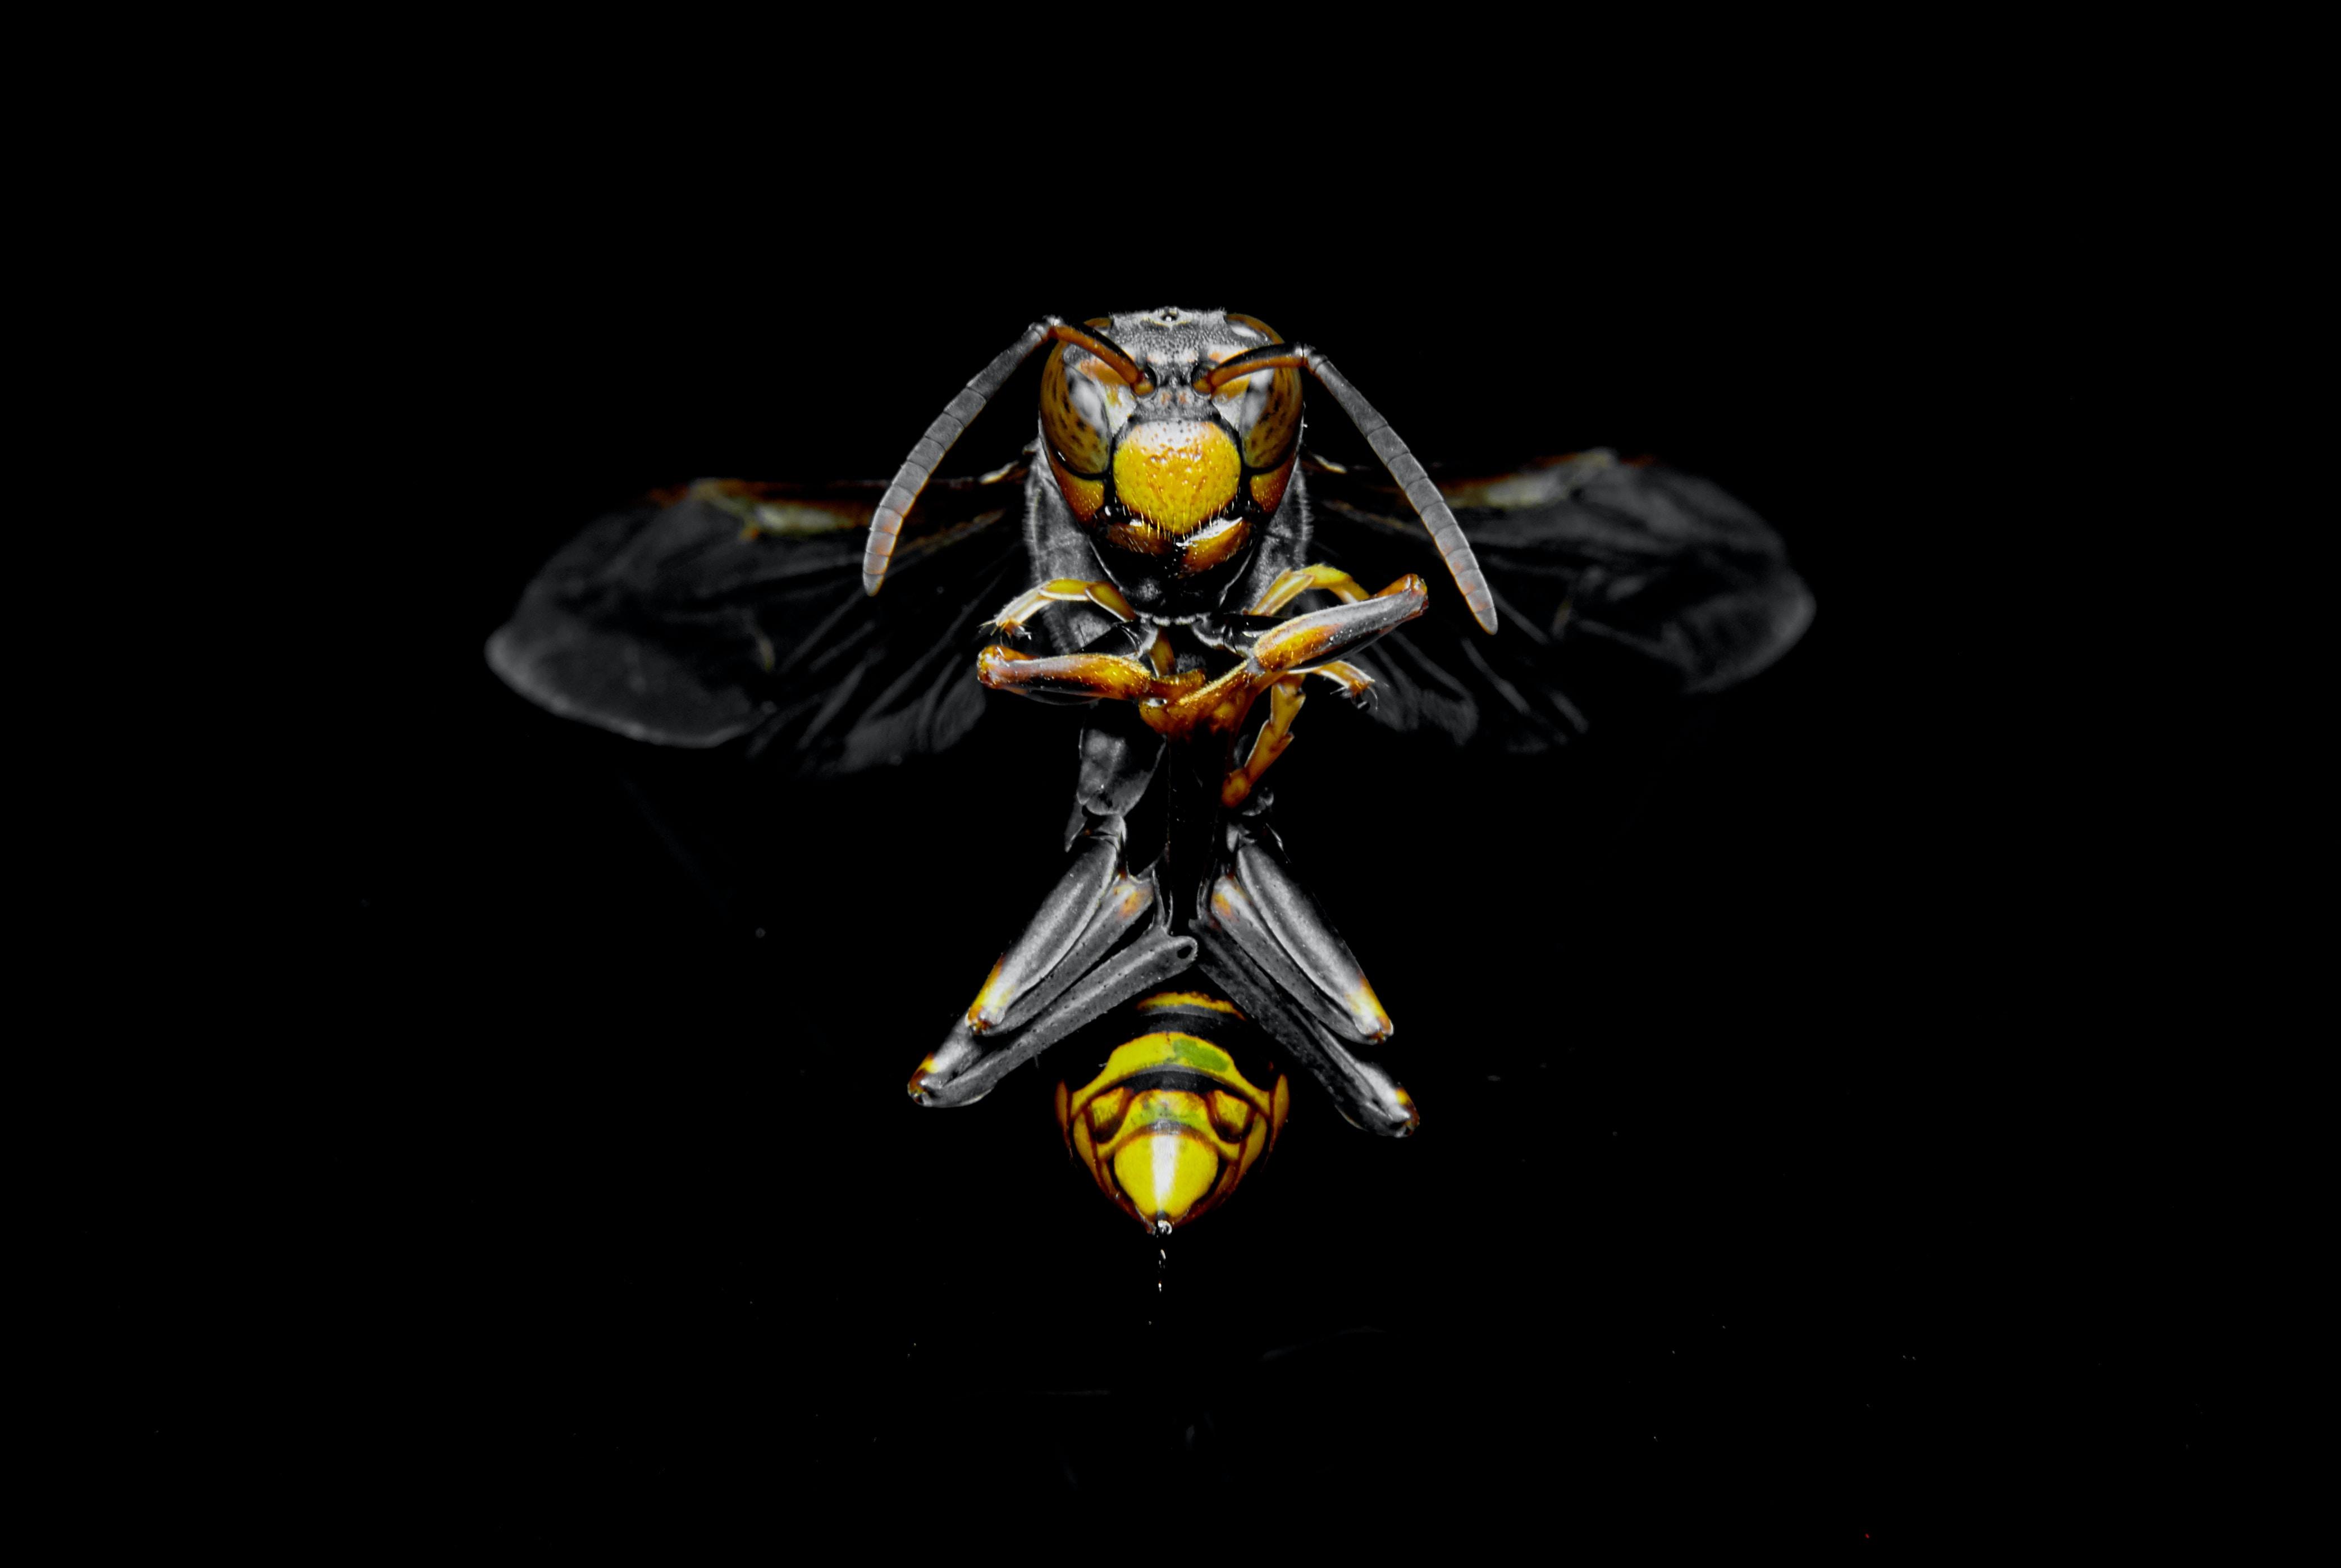 shallow focus photo of a hornet